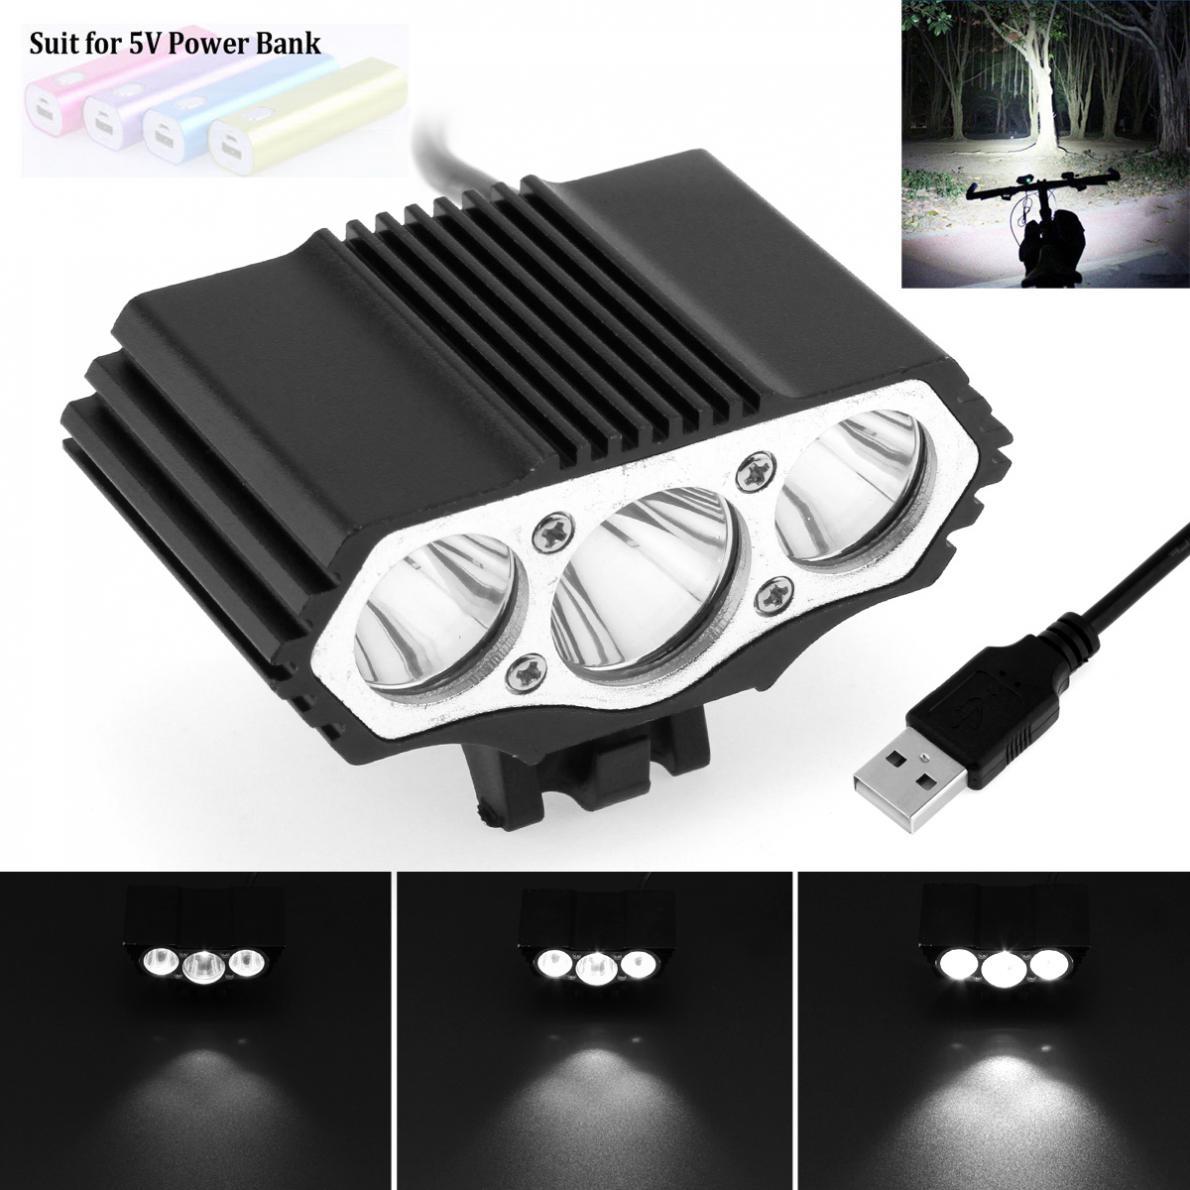 SolarStorm 15000LM 3X XML T6 LED USB Bike Bicycle Headlight Light Torch Battery